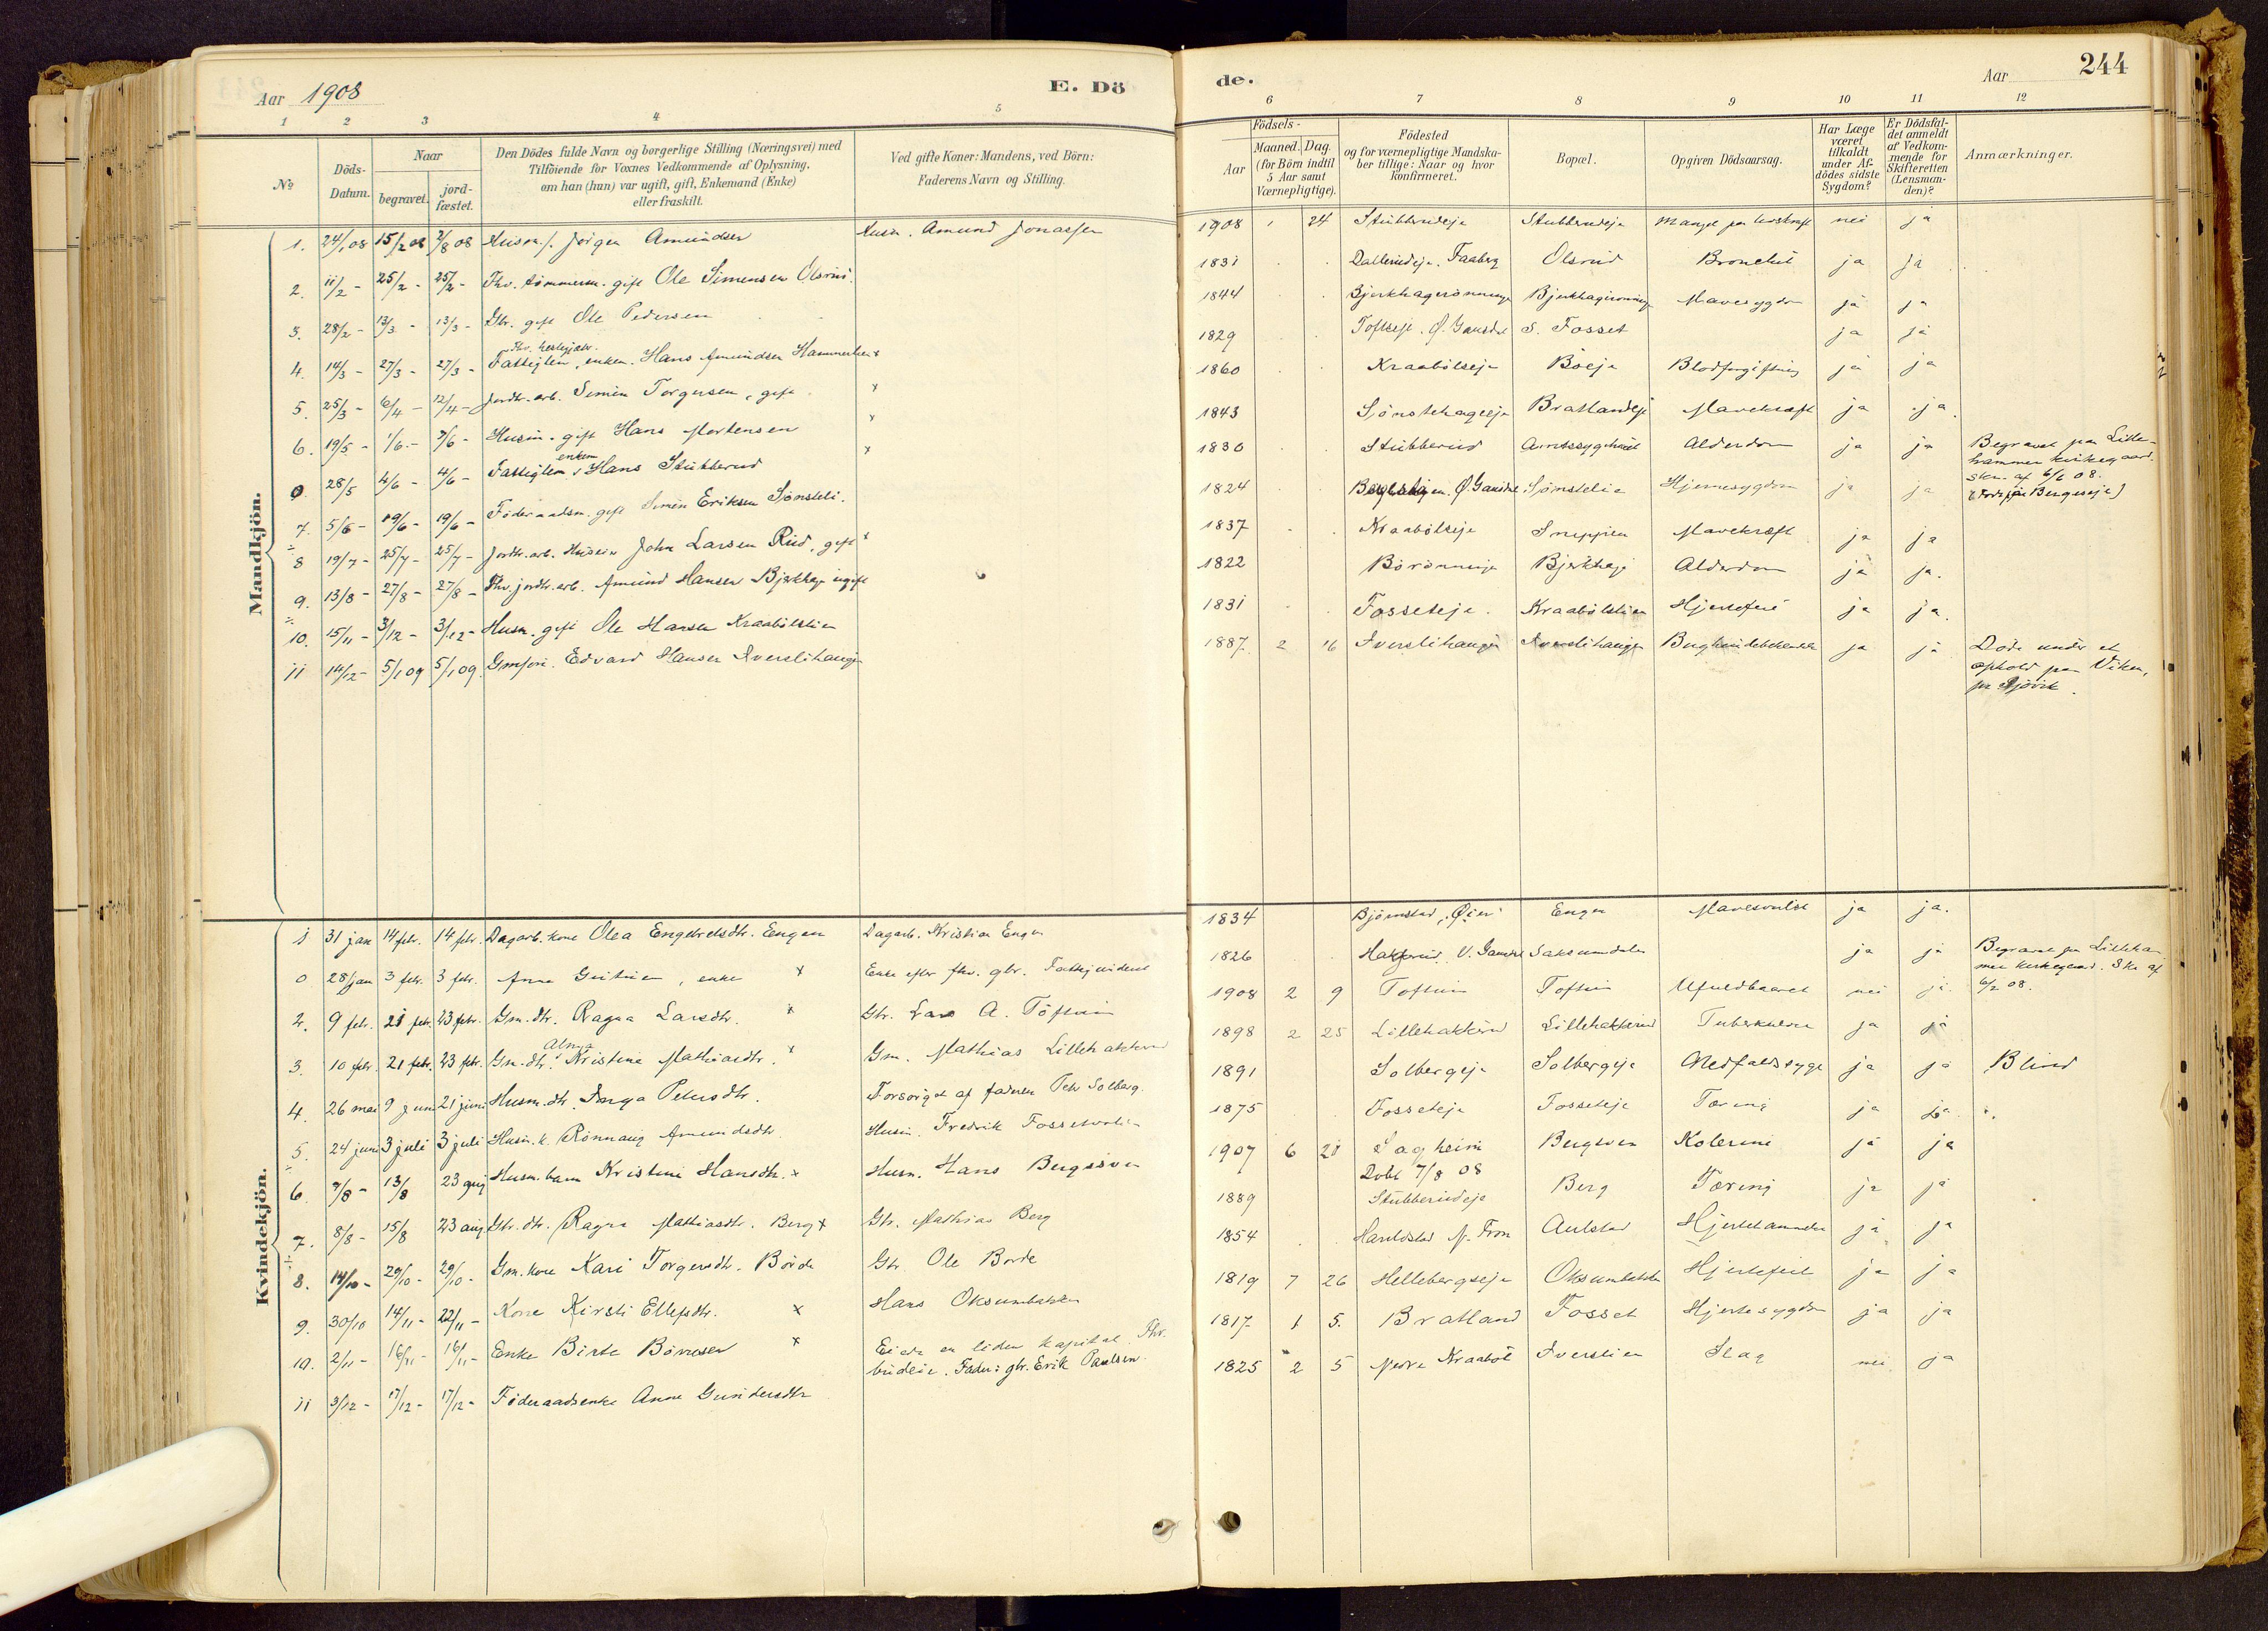 SAH, Vestre Gausdal prestekontor, Ministerialbok nr. 1, 1887-1914, s. 244